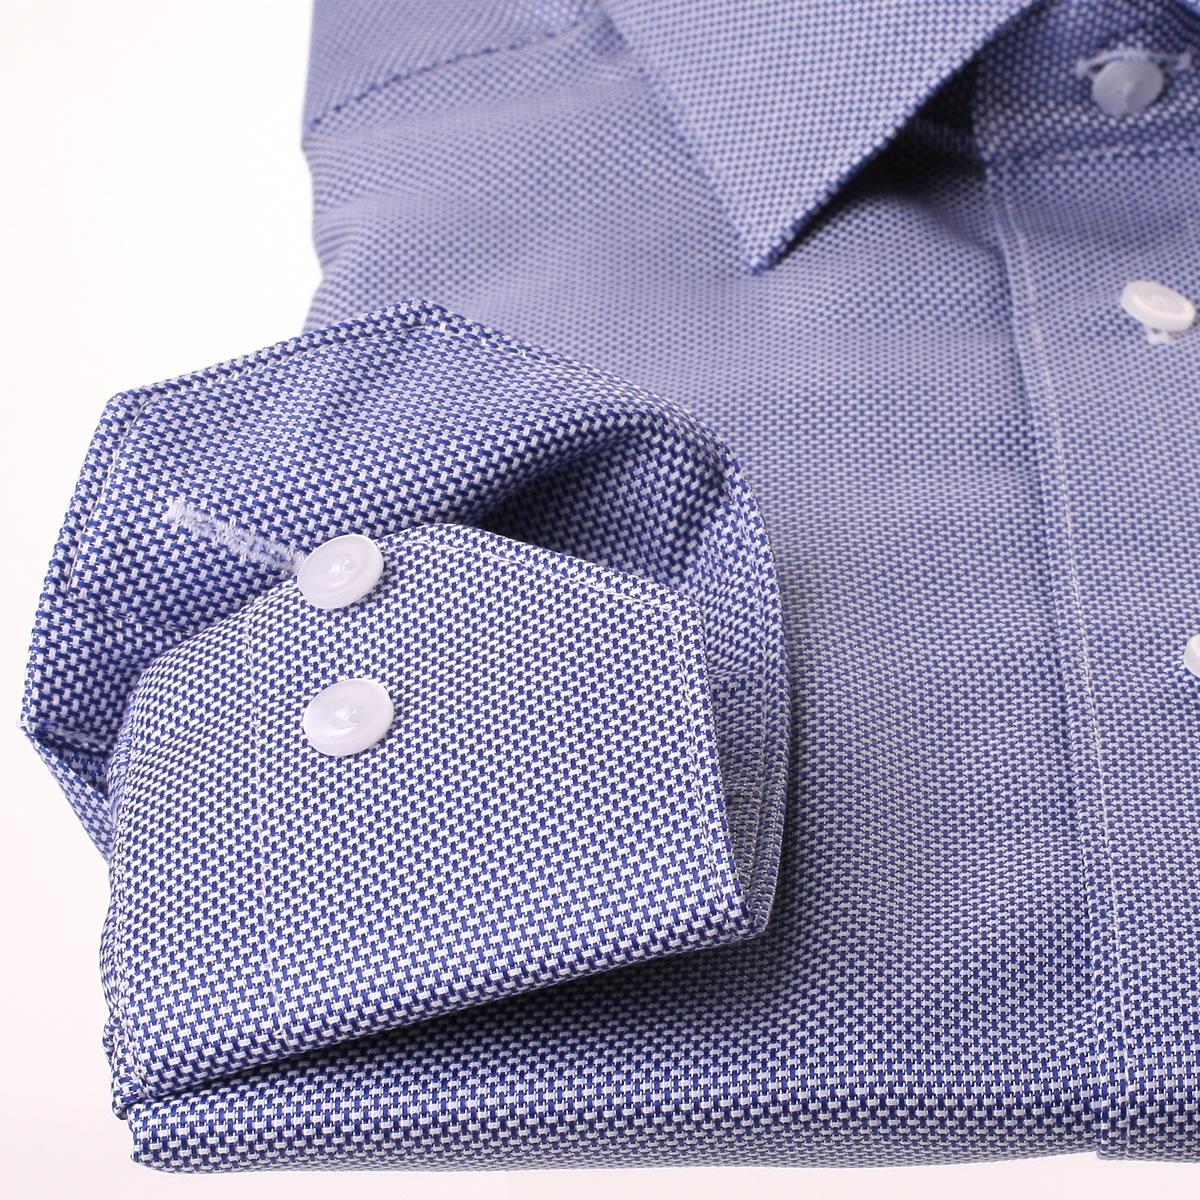 Fabrication De Panier Tissé : Chemise tissu natt? blanc et bleu marine